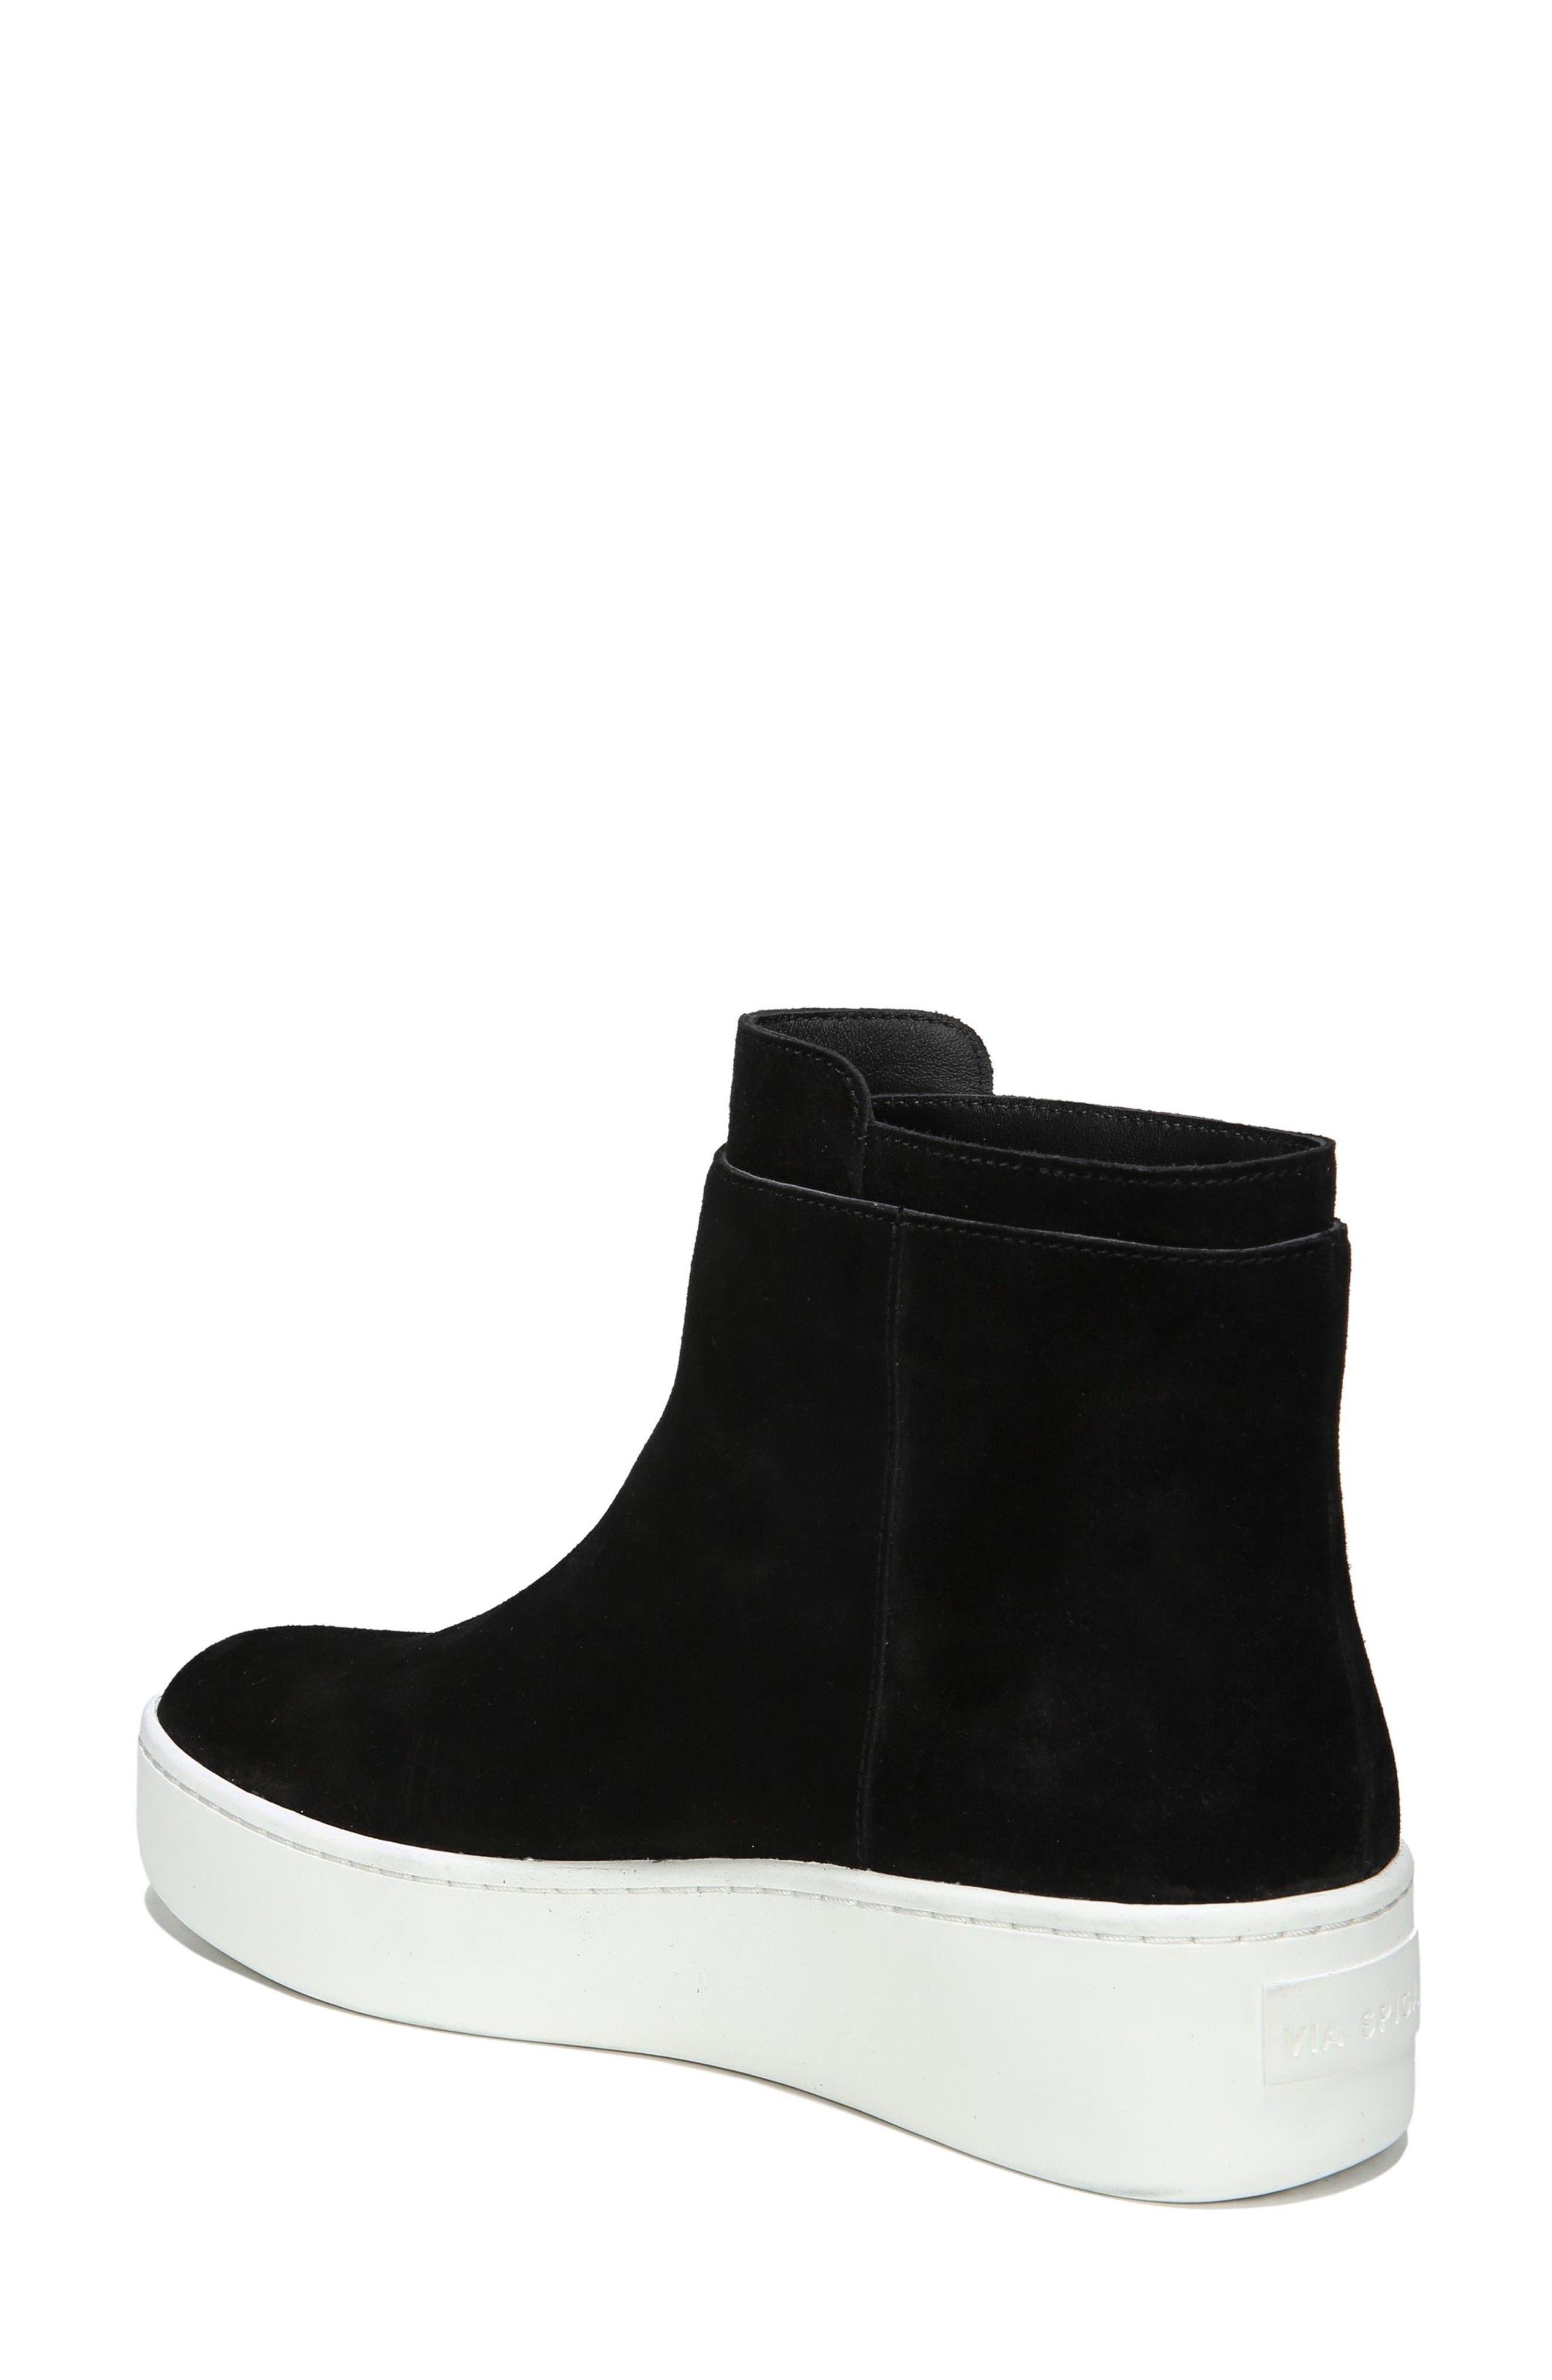 Easton High Top Sneaker,                             Alternate thumbnail 4, color,